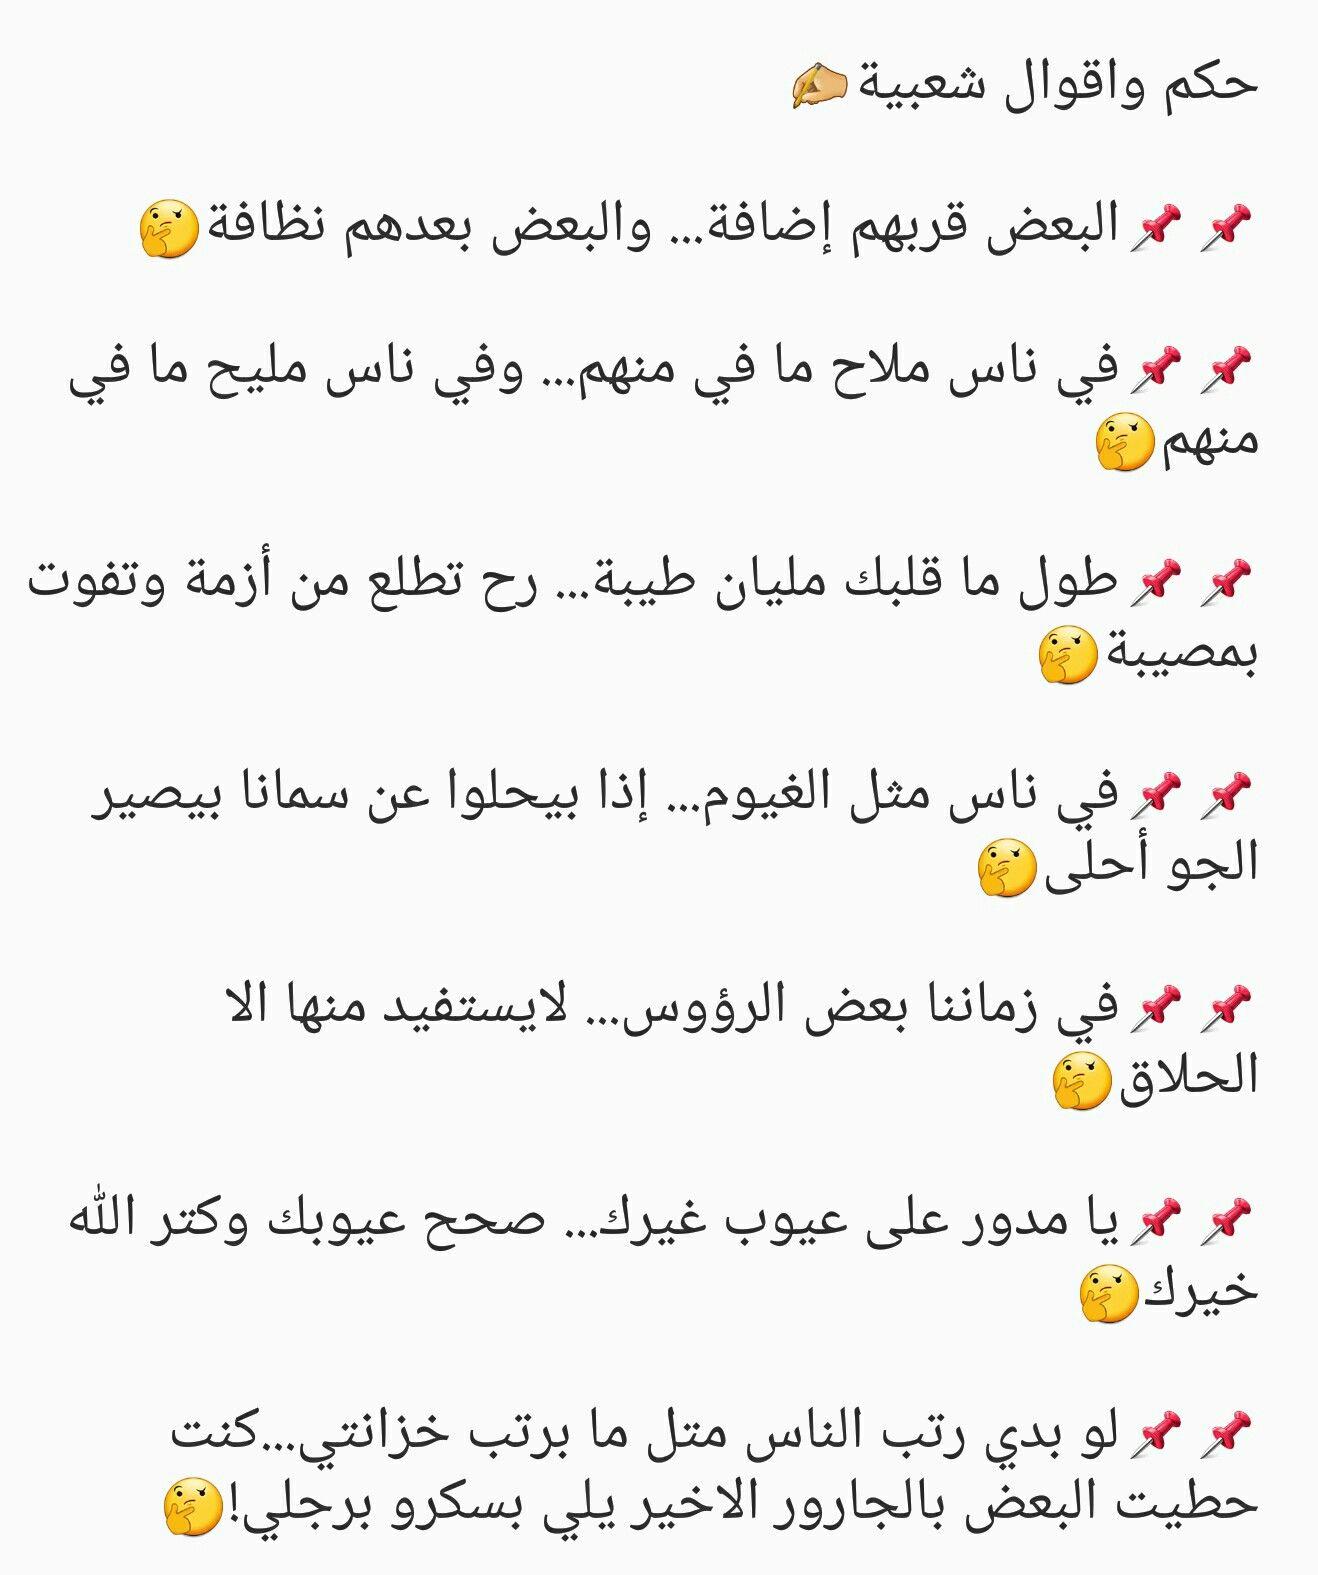 امثال شعبية Wise Quotes Arabic Funny Funny Science Jokes